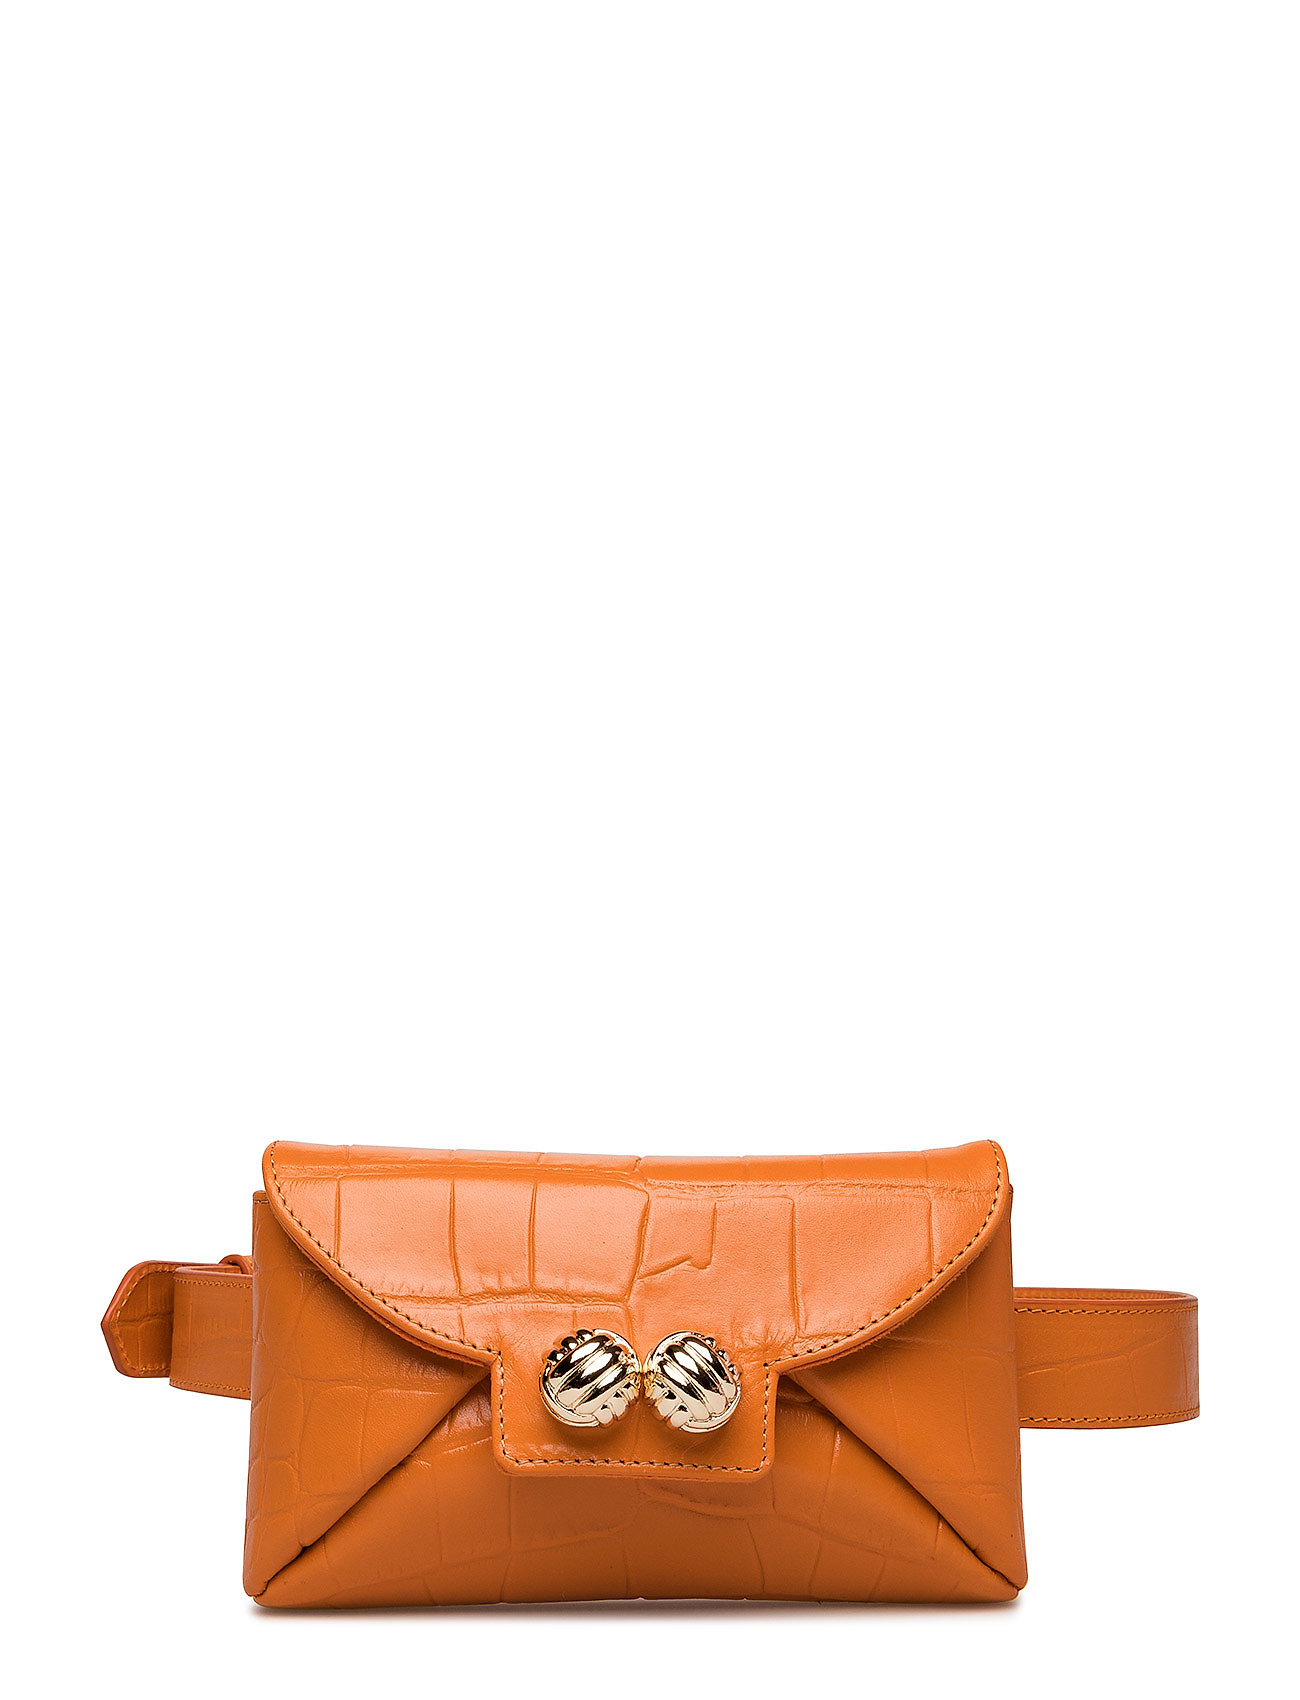 Leowulff Tiny bag